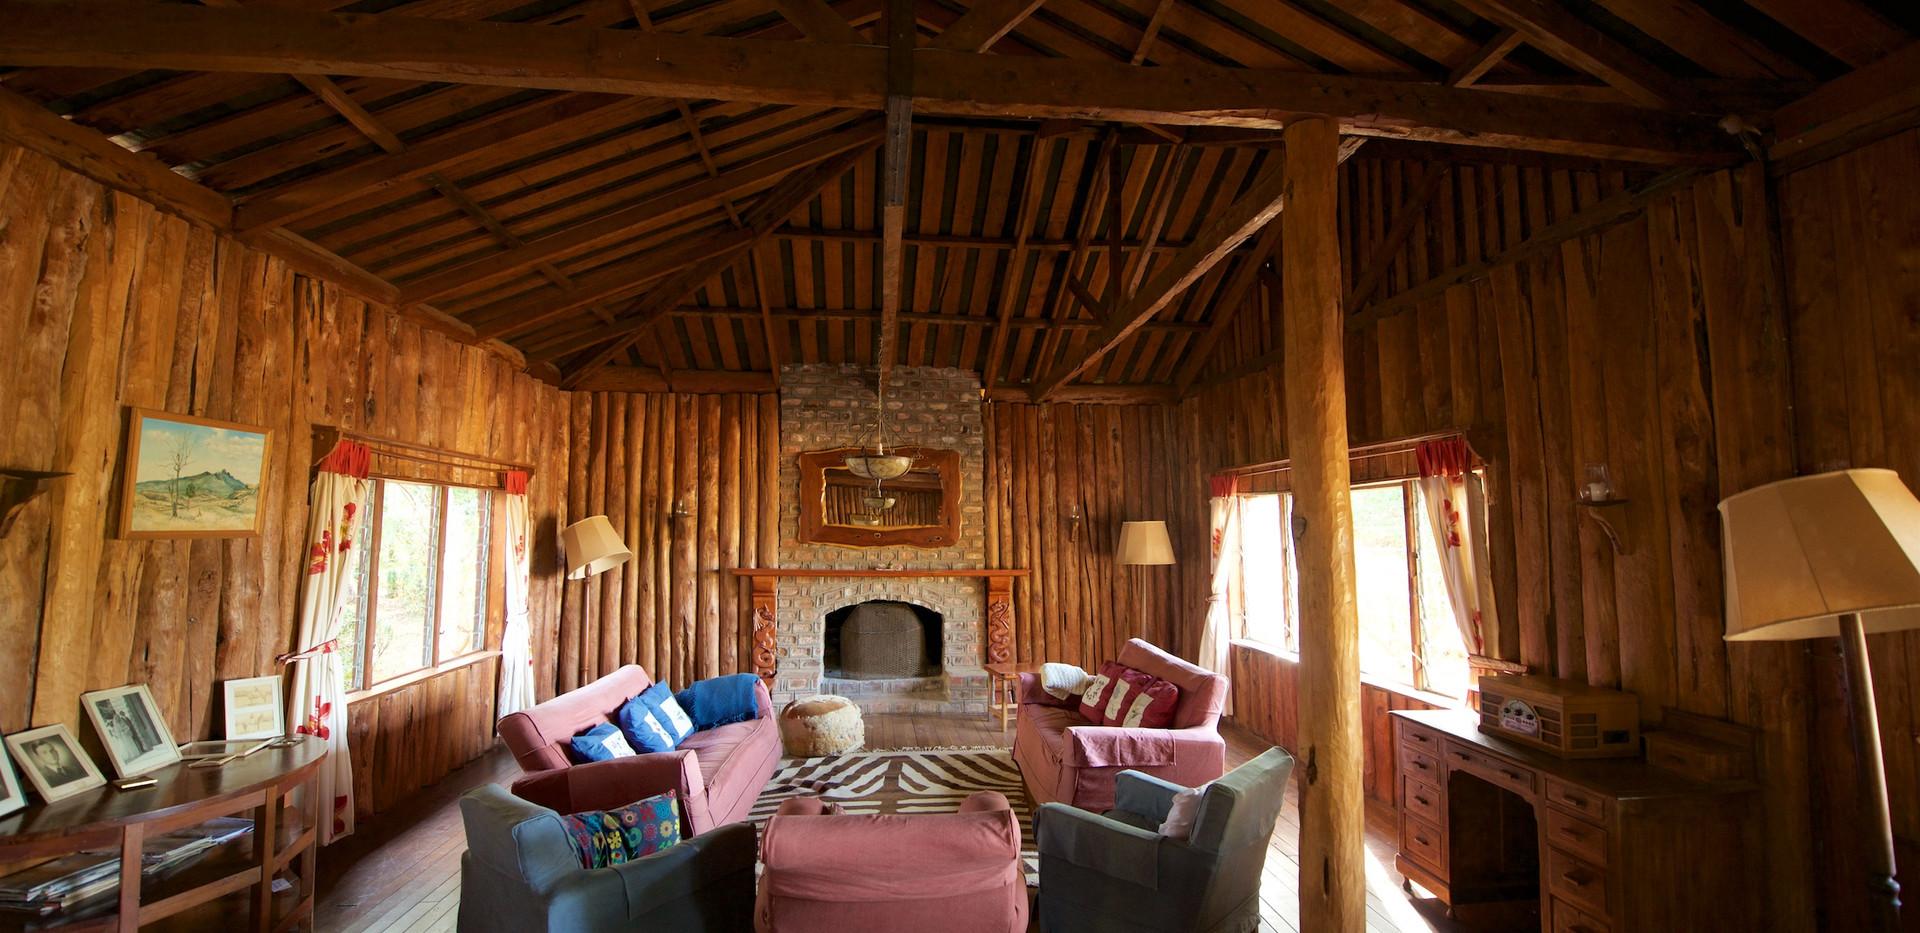 Lolldaiga-guesthouse-1096.jpg